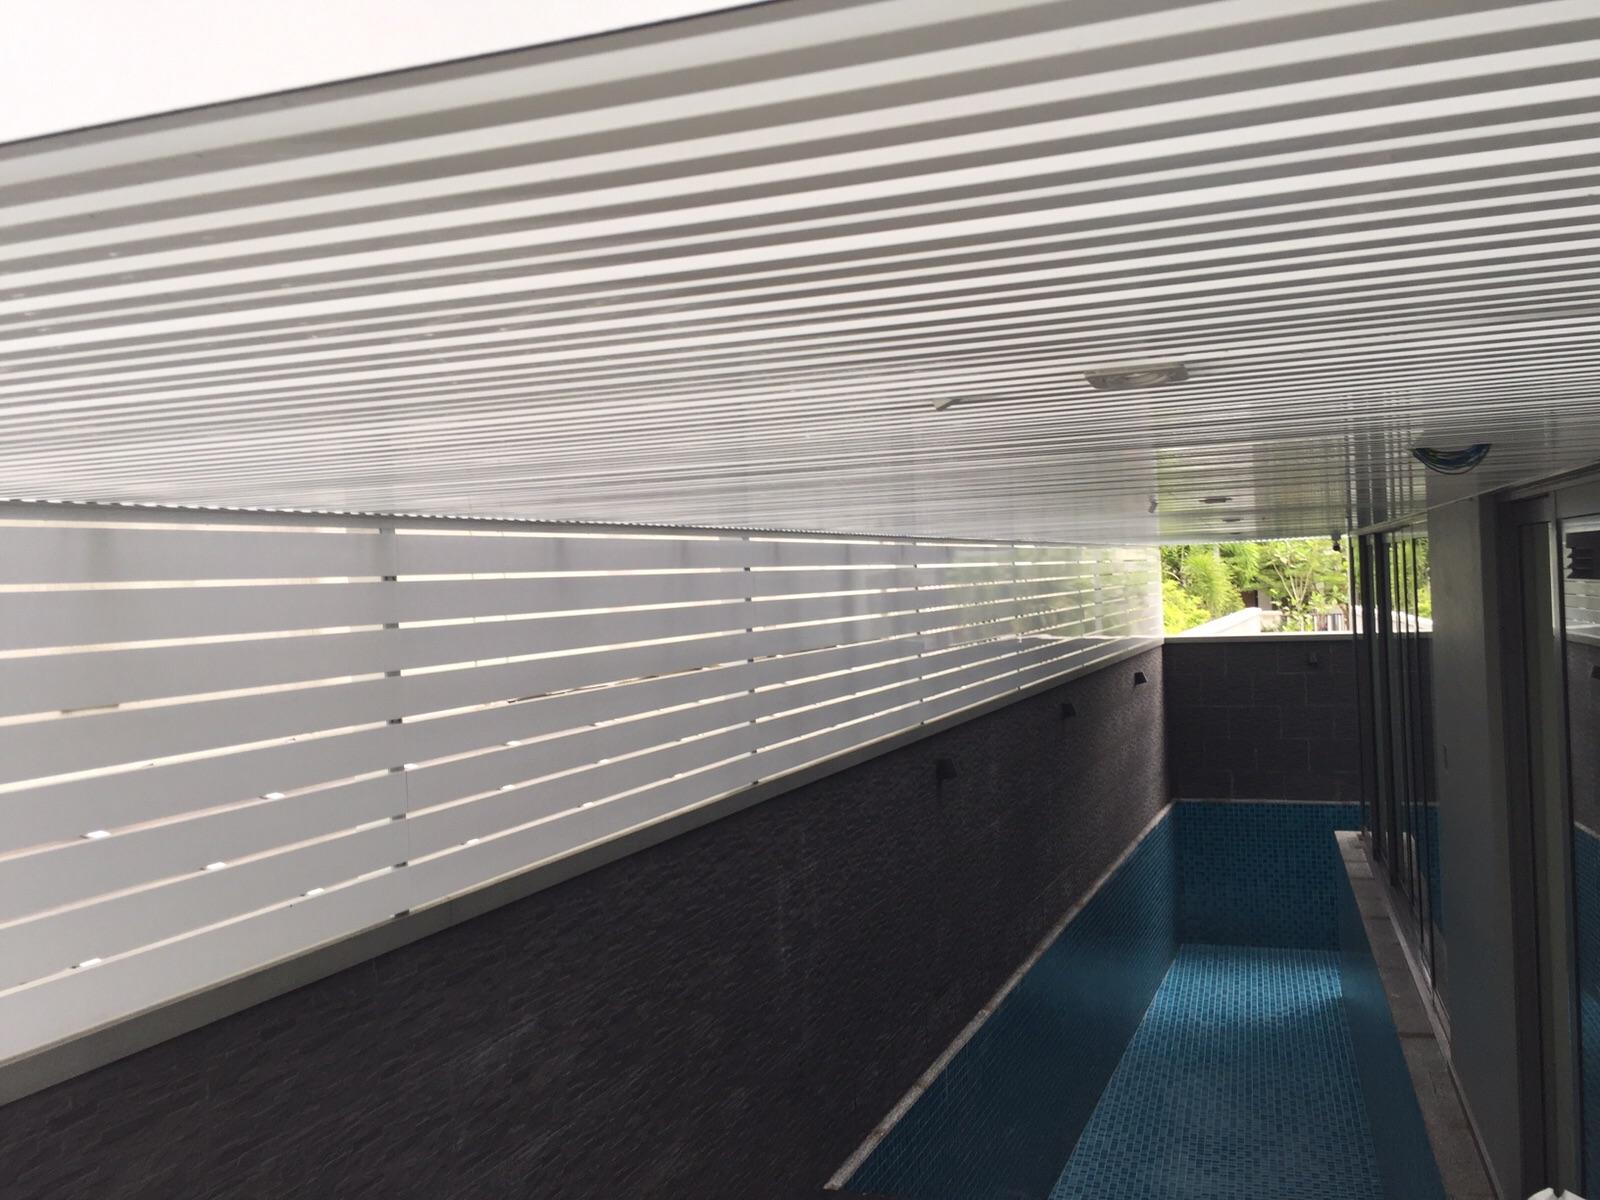 To Enclose Swimming Pool Area With Aluminium Trellis Wall